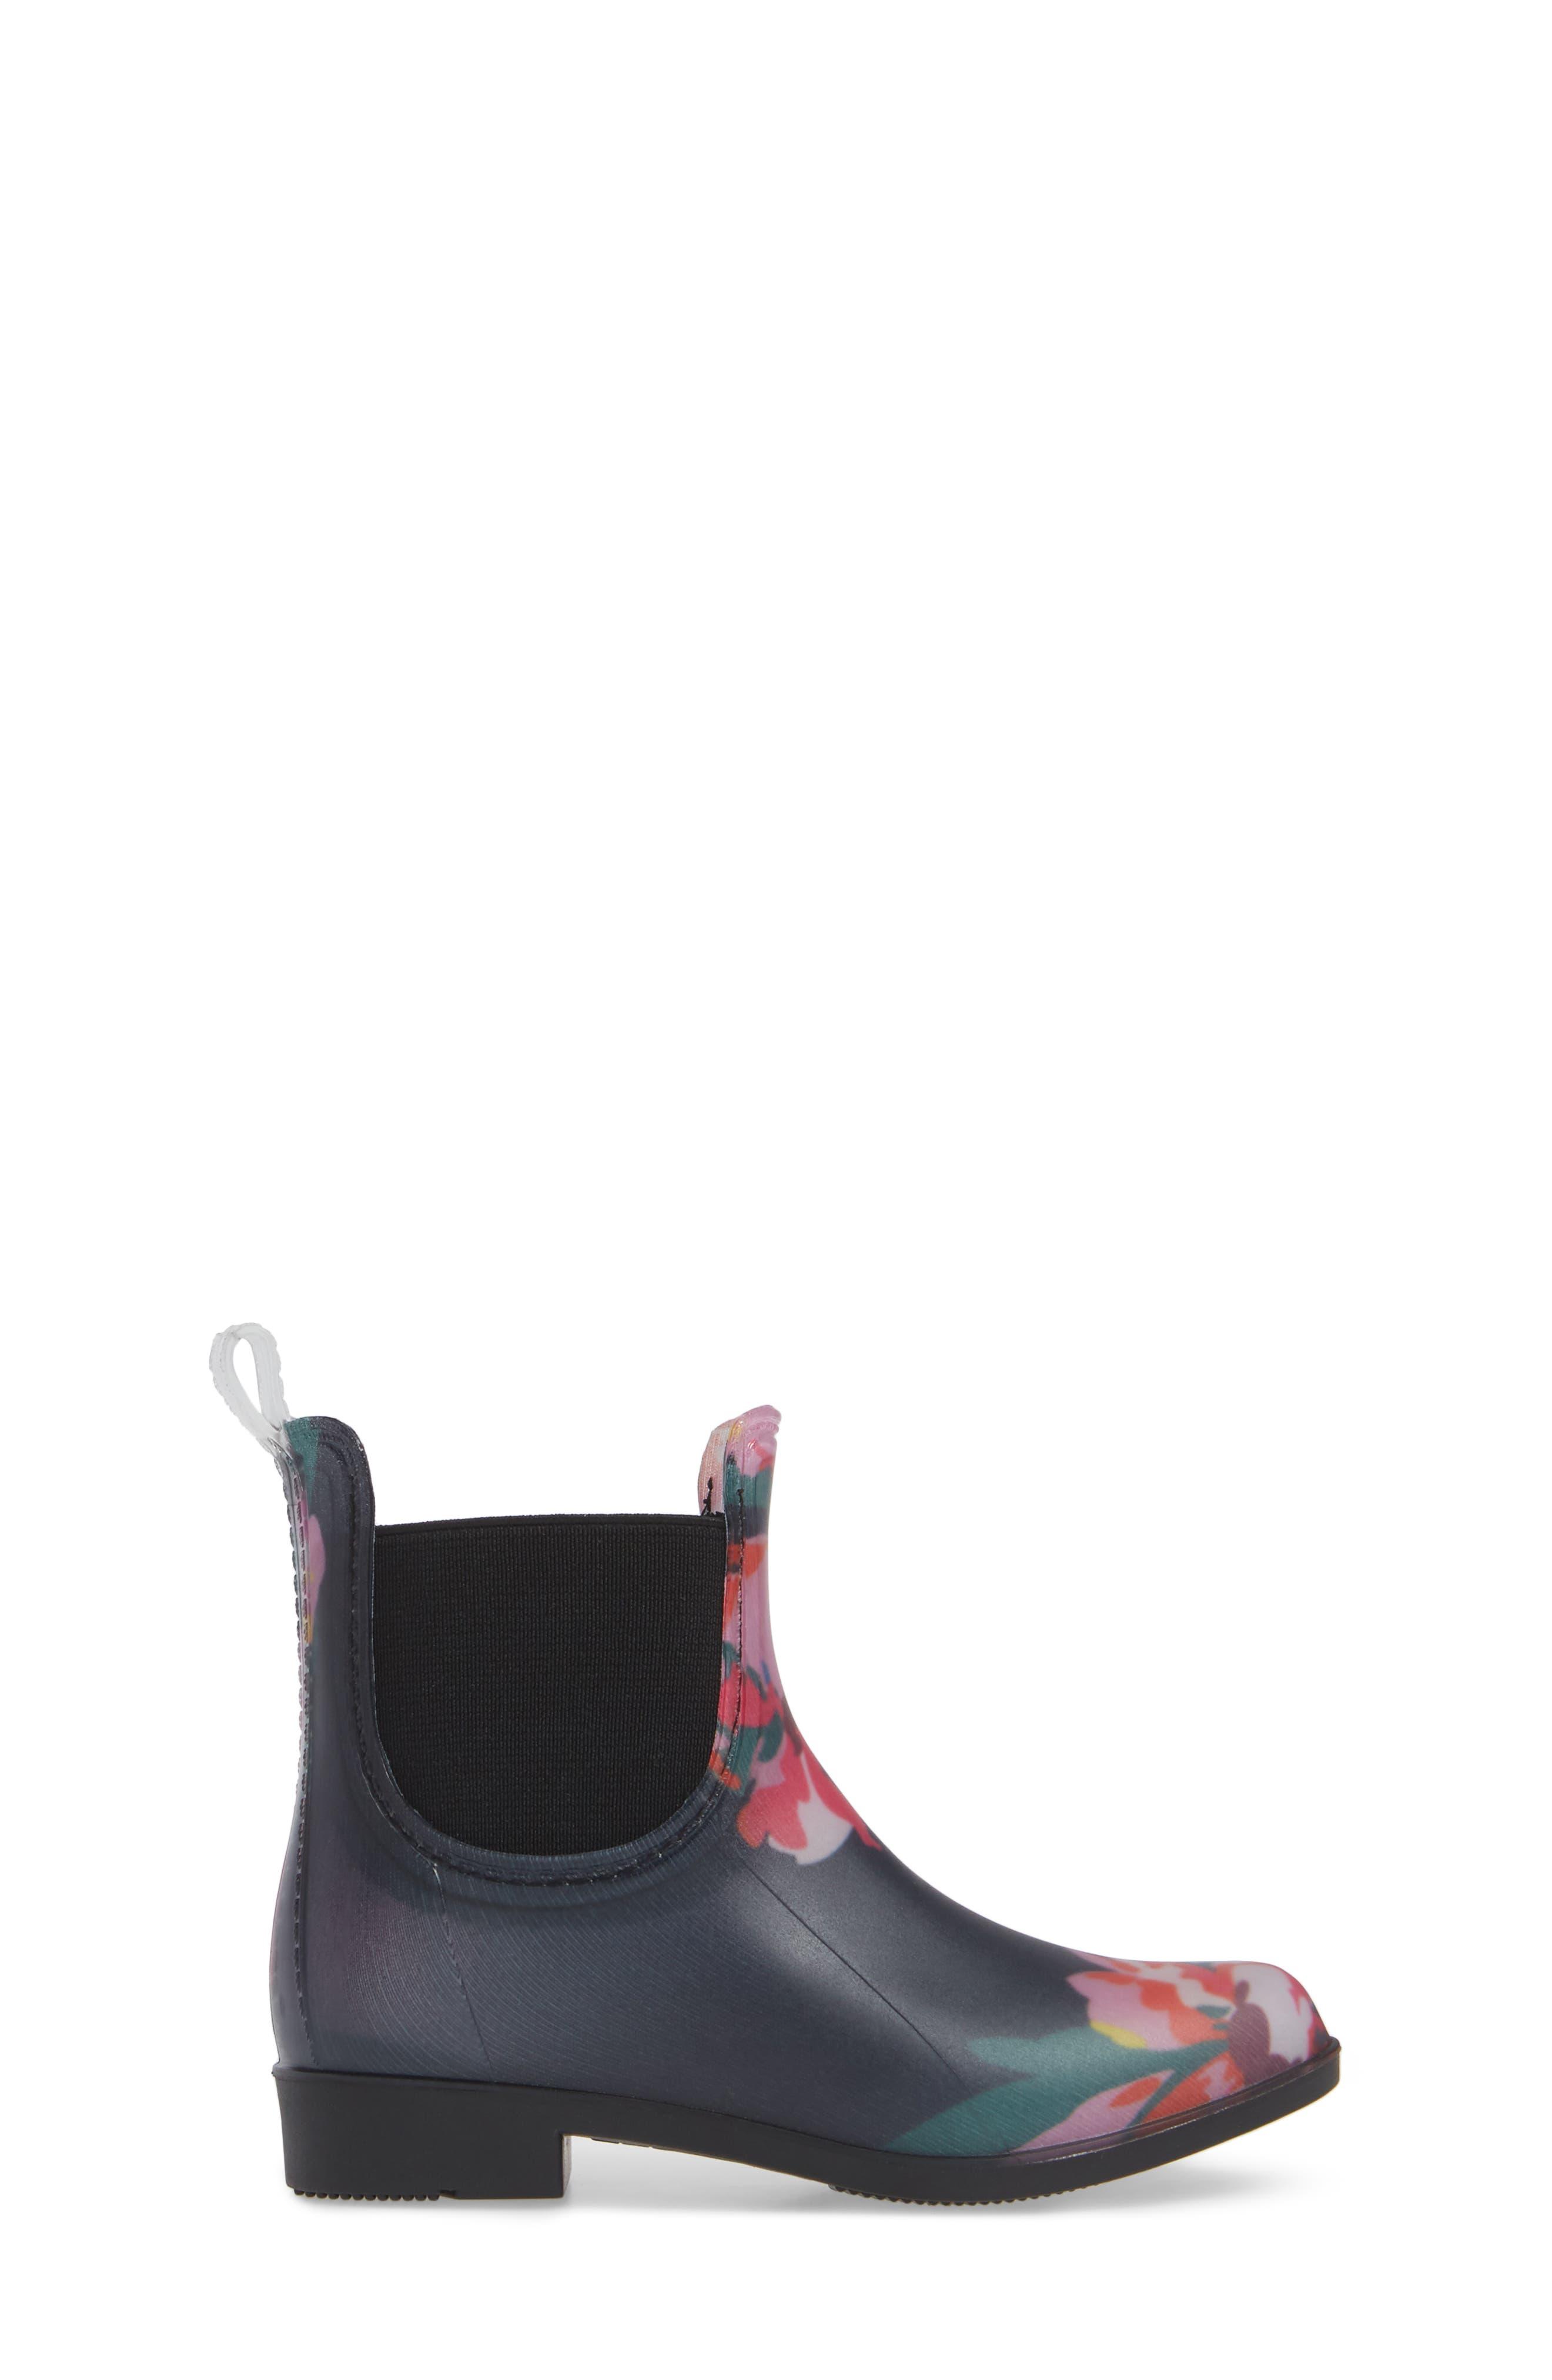 Chelsea Rain Boot,                             Alternate thumbnail 3, color,                             NAVY GRANNY FLORAL